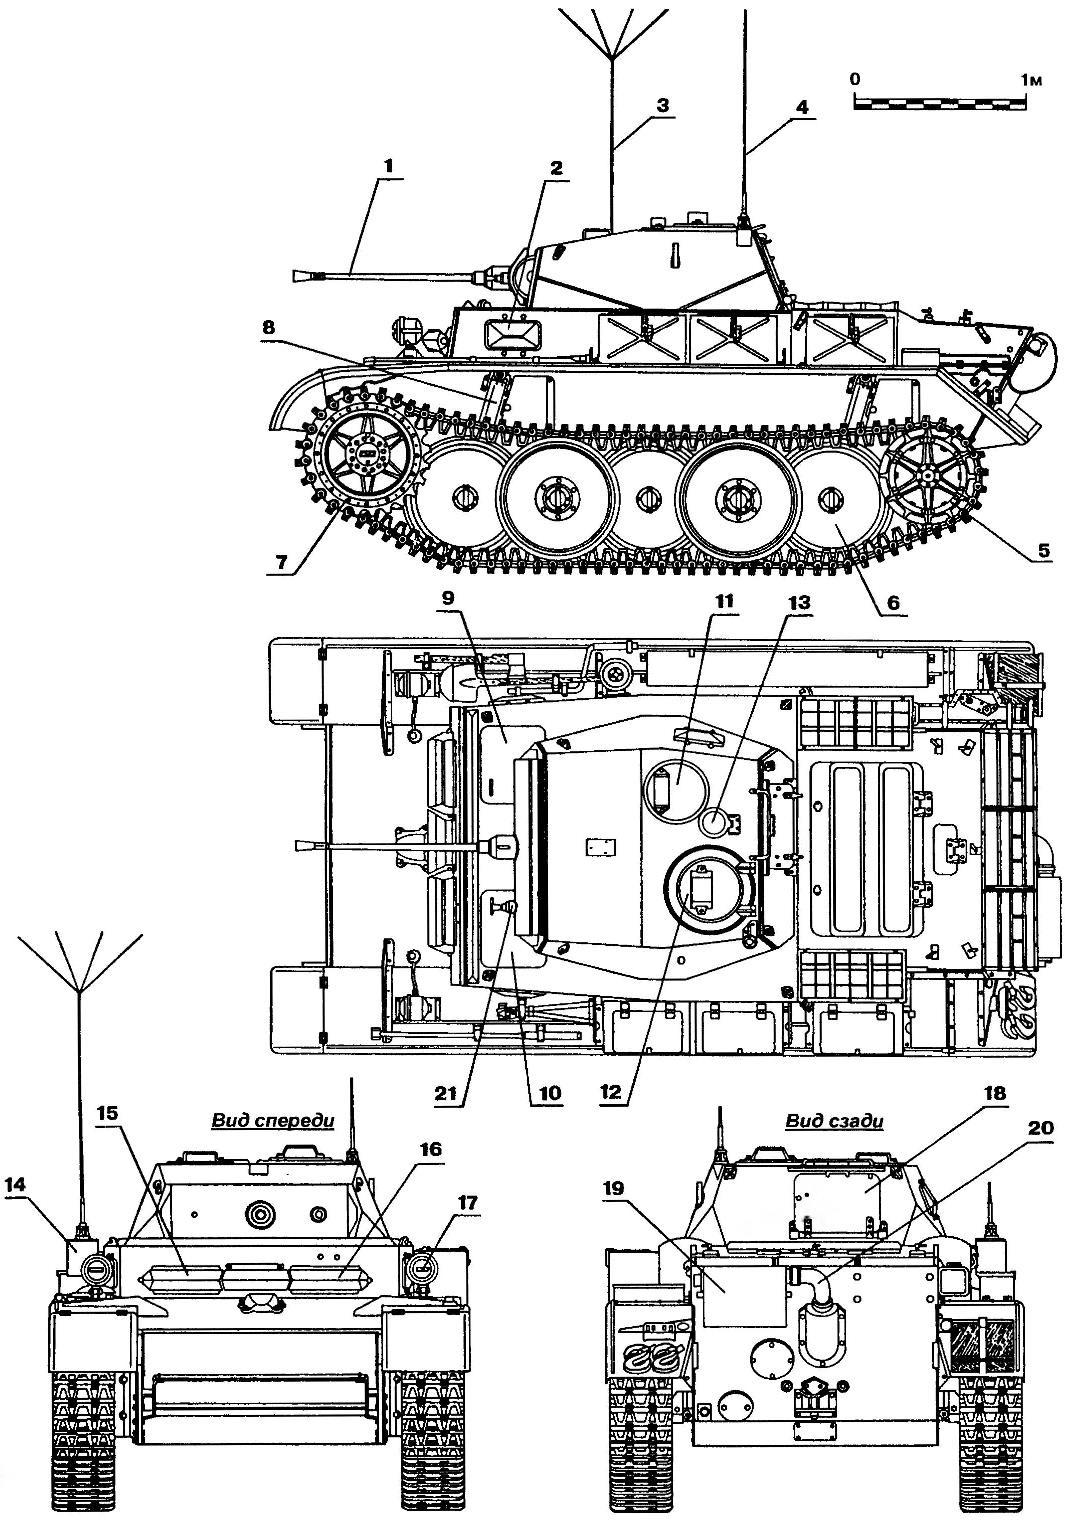 1976 Mg Midget Wiring Diagram 1976 Circuit Diagrams